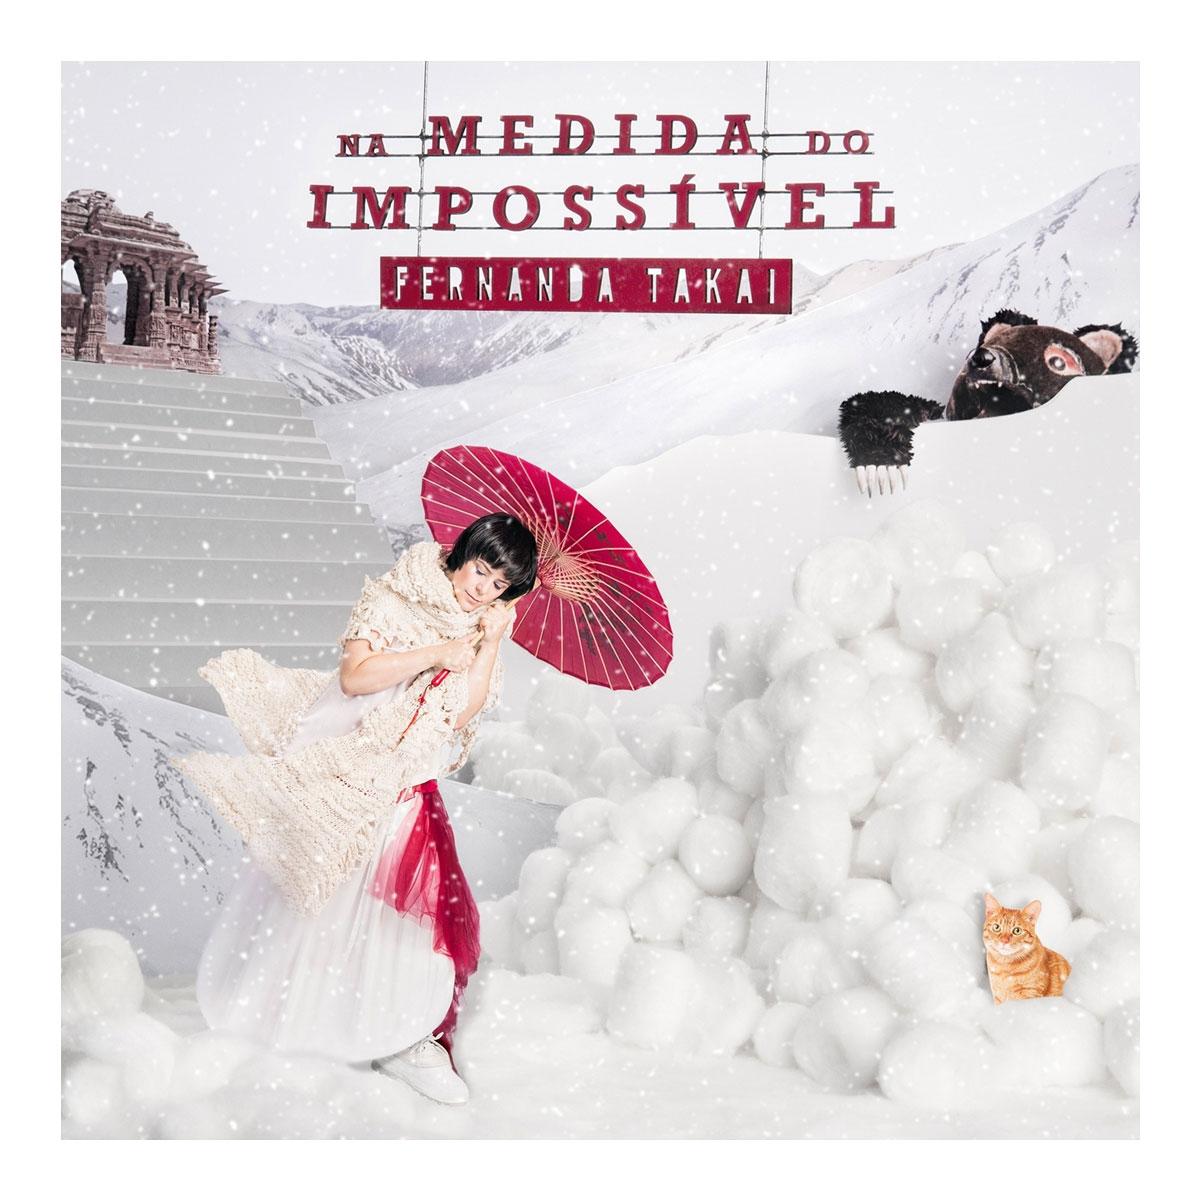 LP Fernanda Takai Na Medida Do Impossível